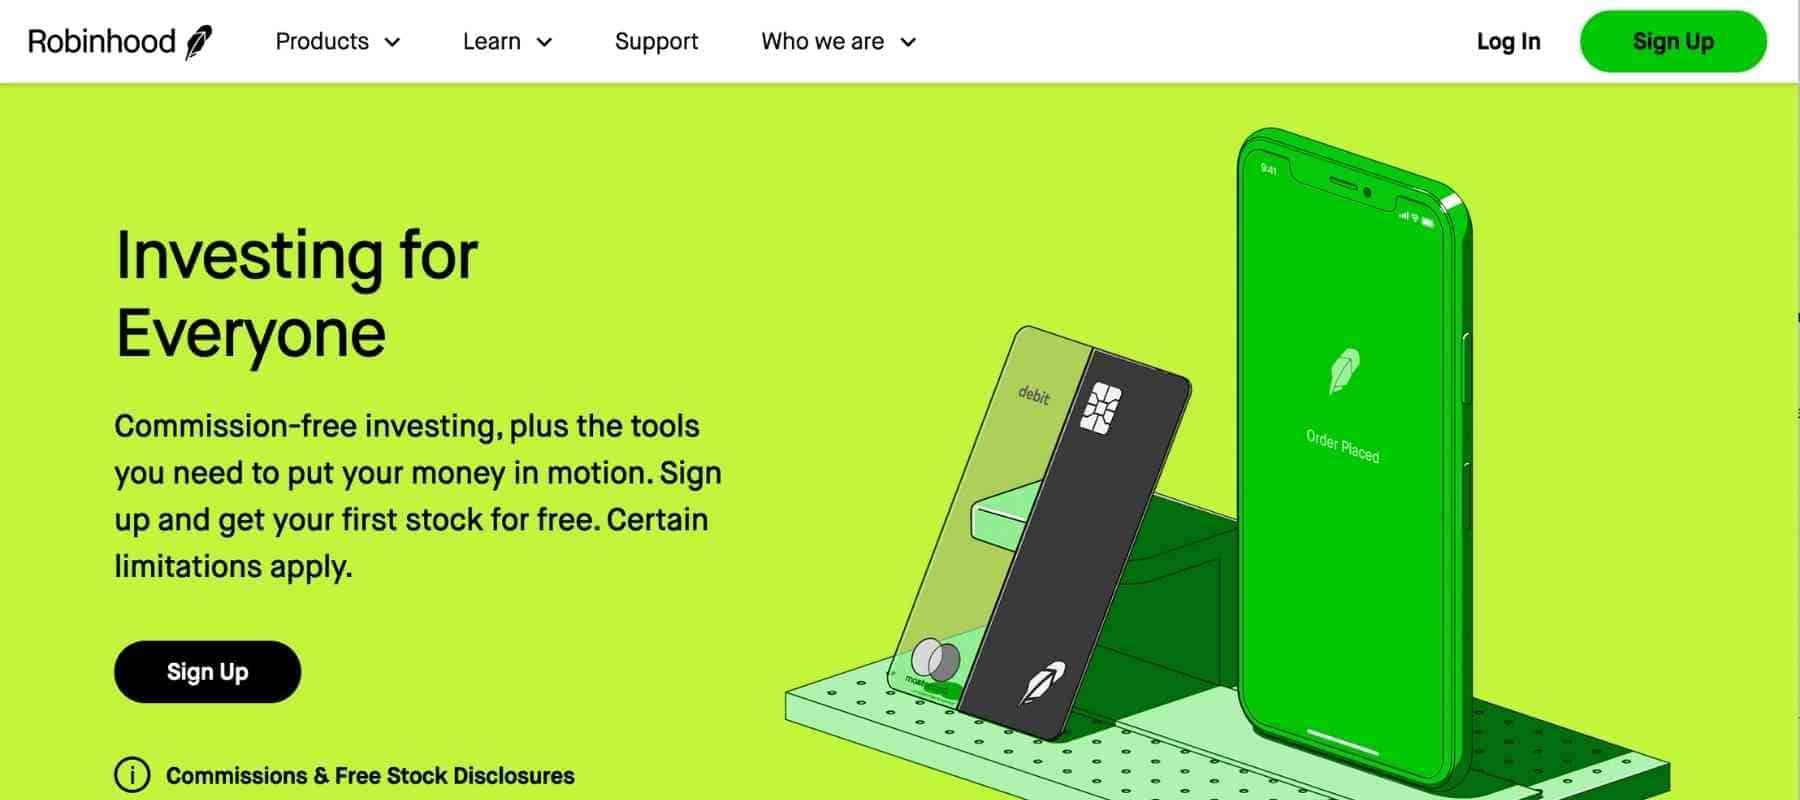 Best Passive Income Apps - Robinhood